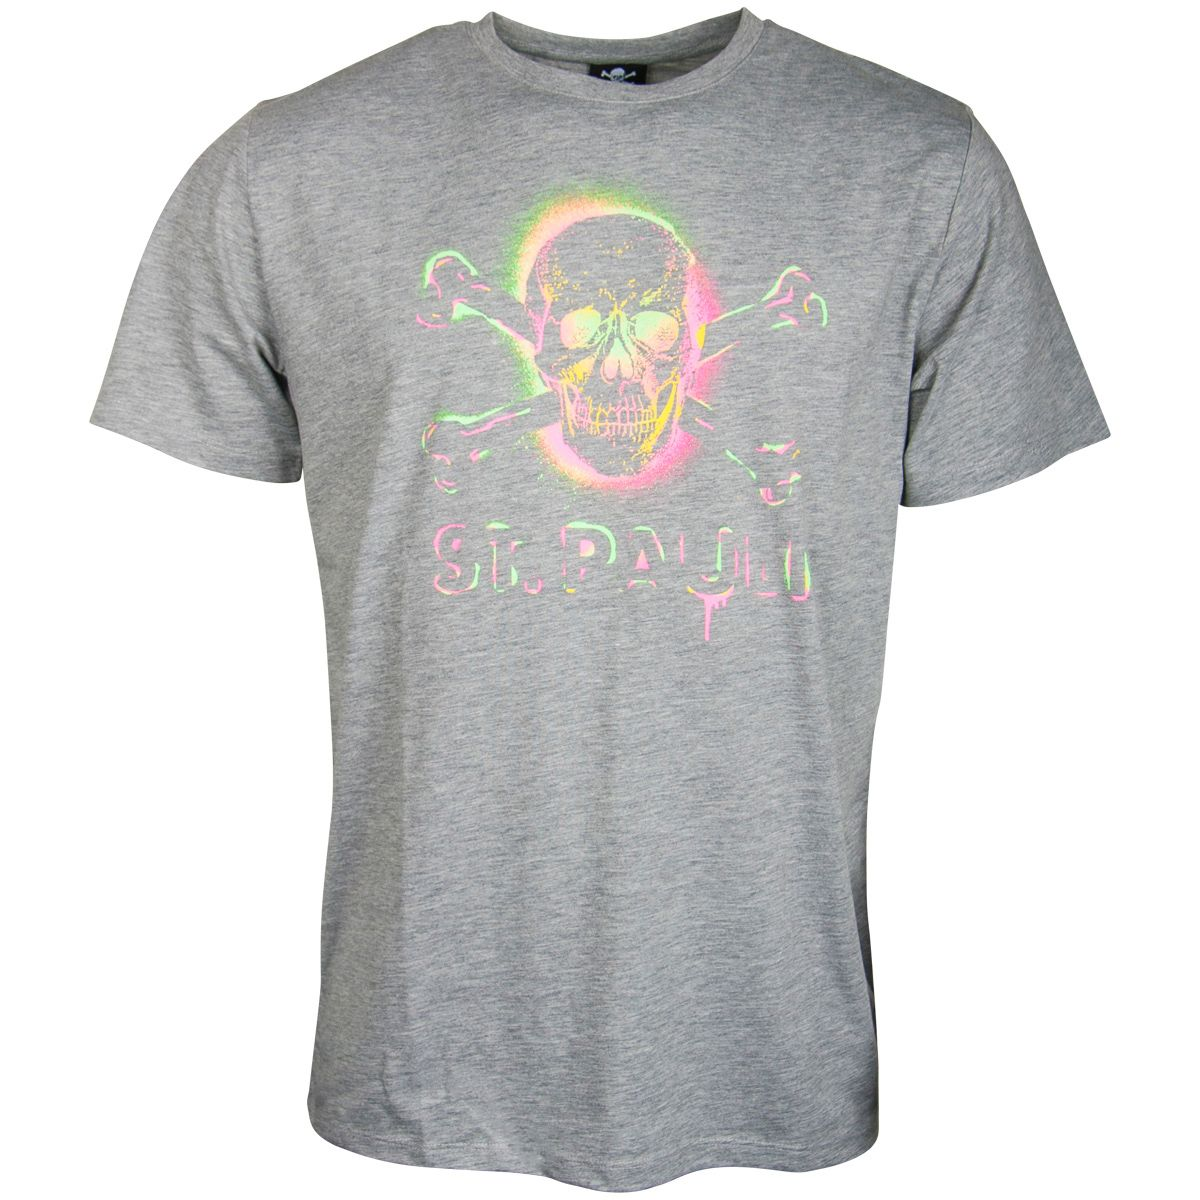 FC St. Pauli - T-Shirt Graffiti Neon Totenkopf - grau